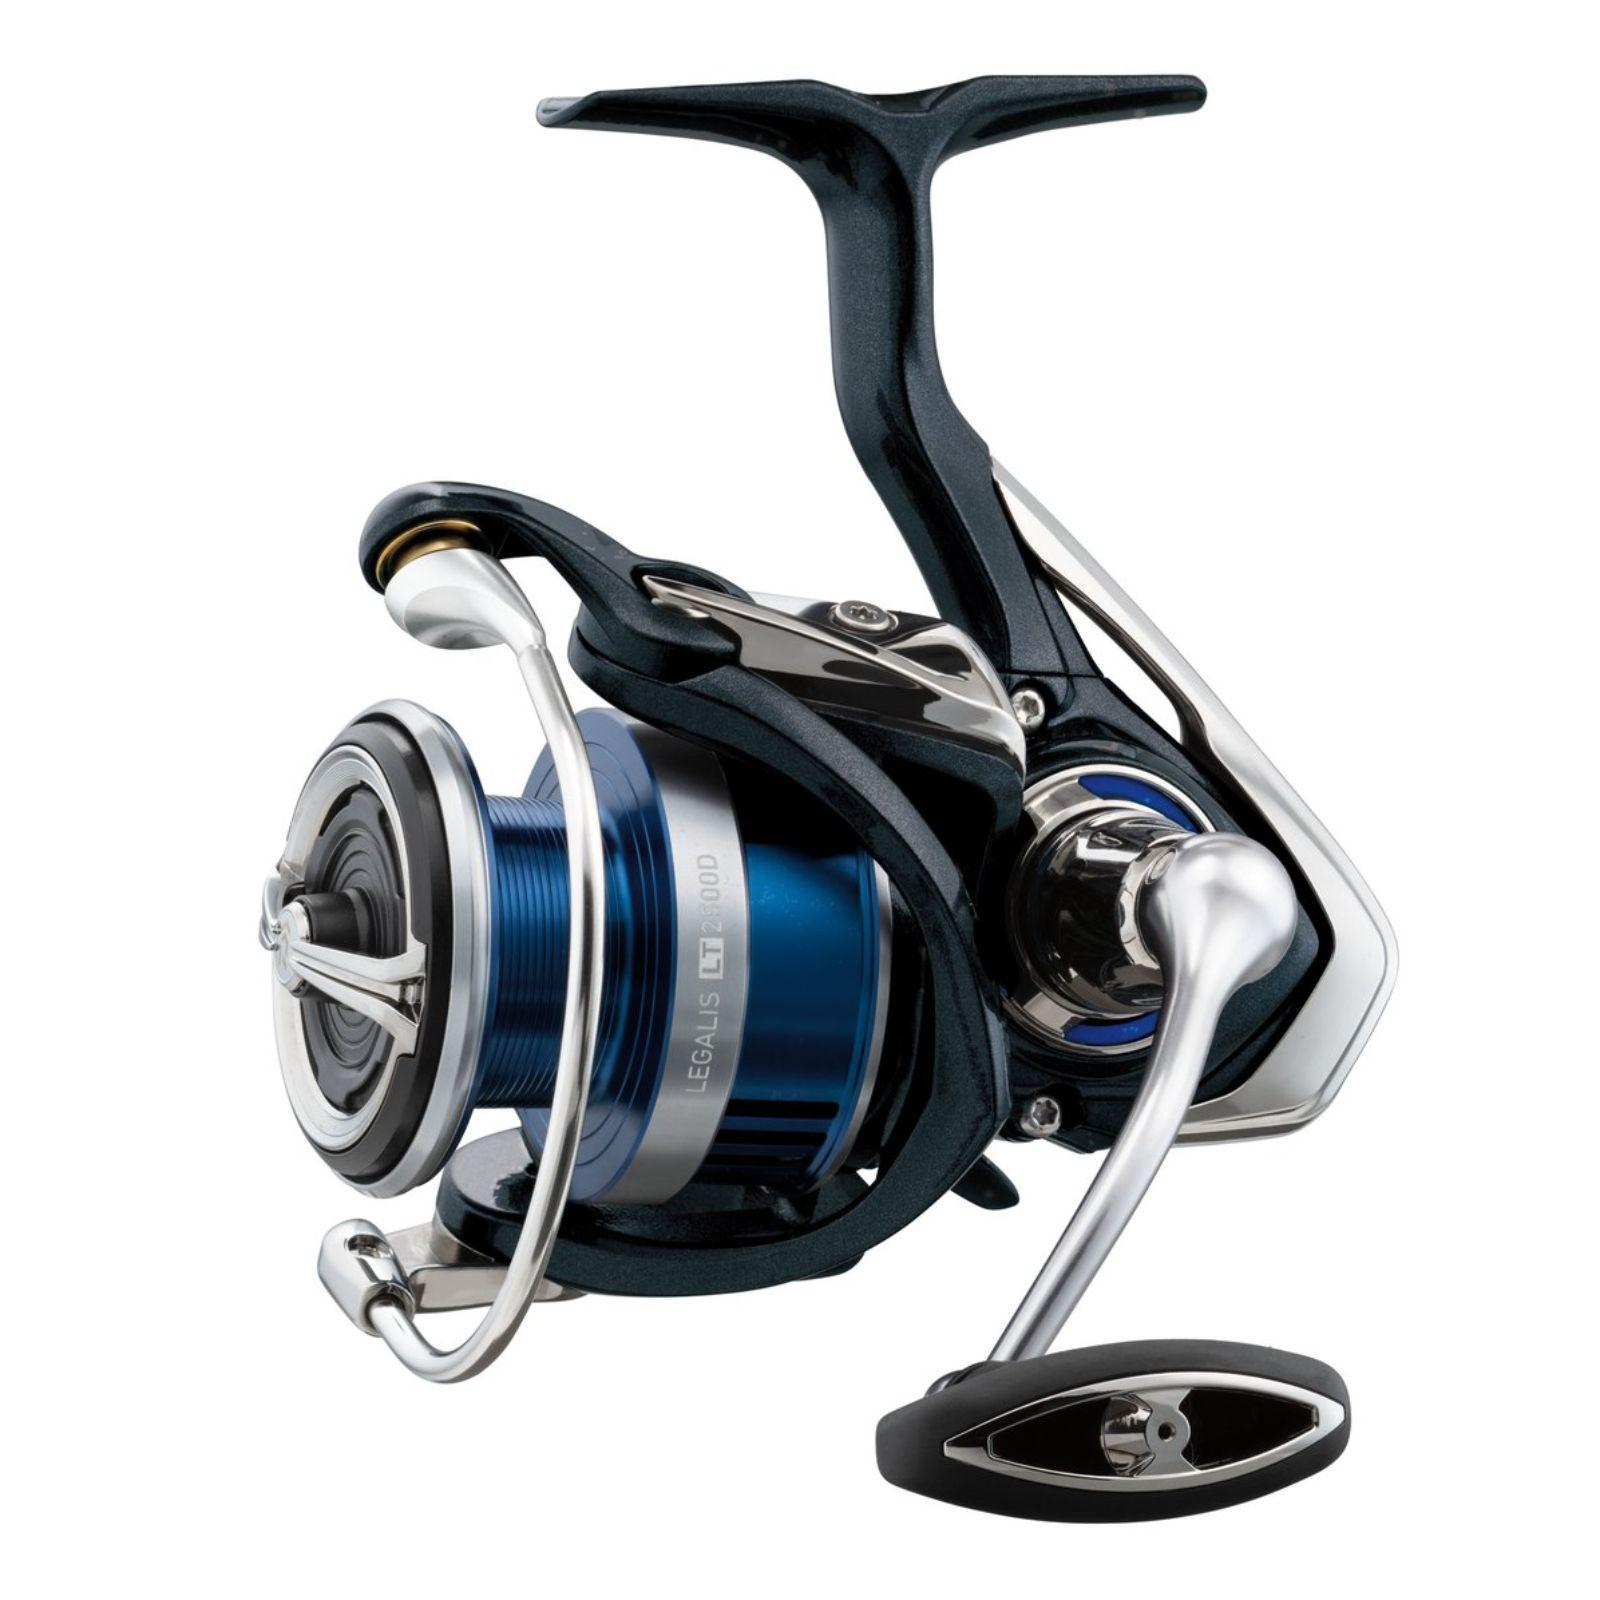 Daiwa Legalis LT 2000D Spinning Reel